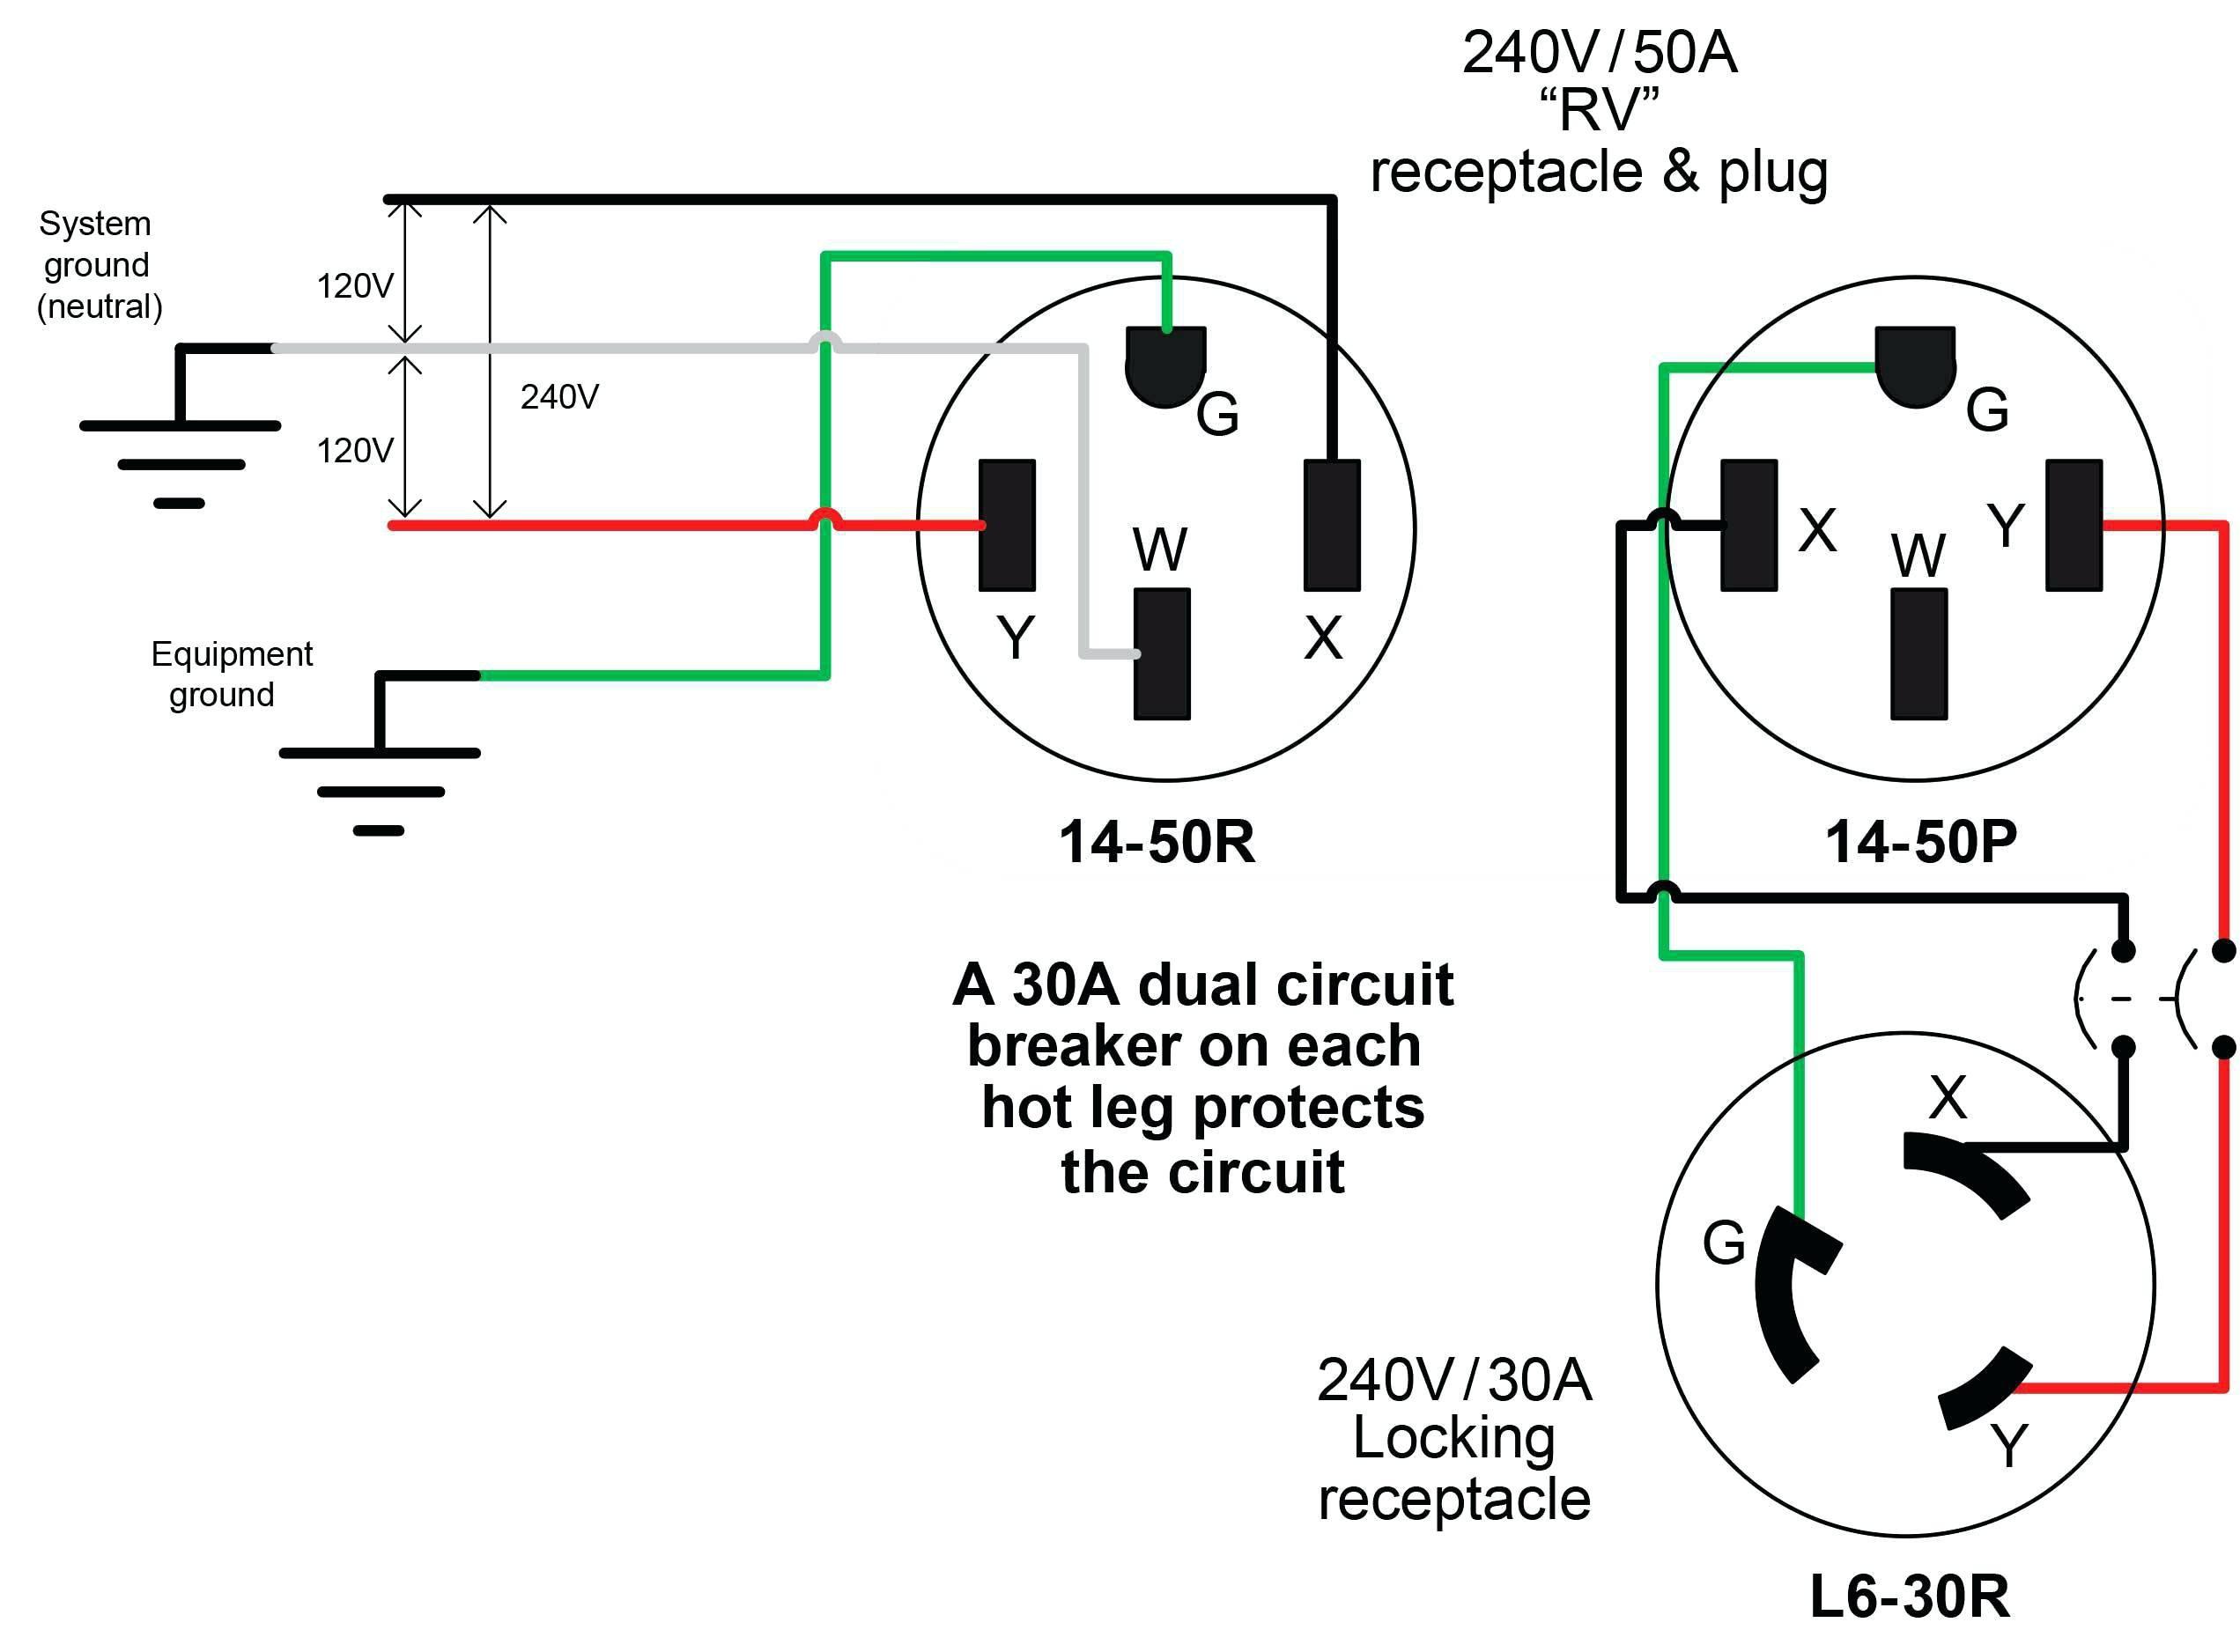 4 Prong Twist Lock Plug Wiring Diagram Luxury Twist Lock Plug Wiring Diagram Wiring Diagram